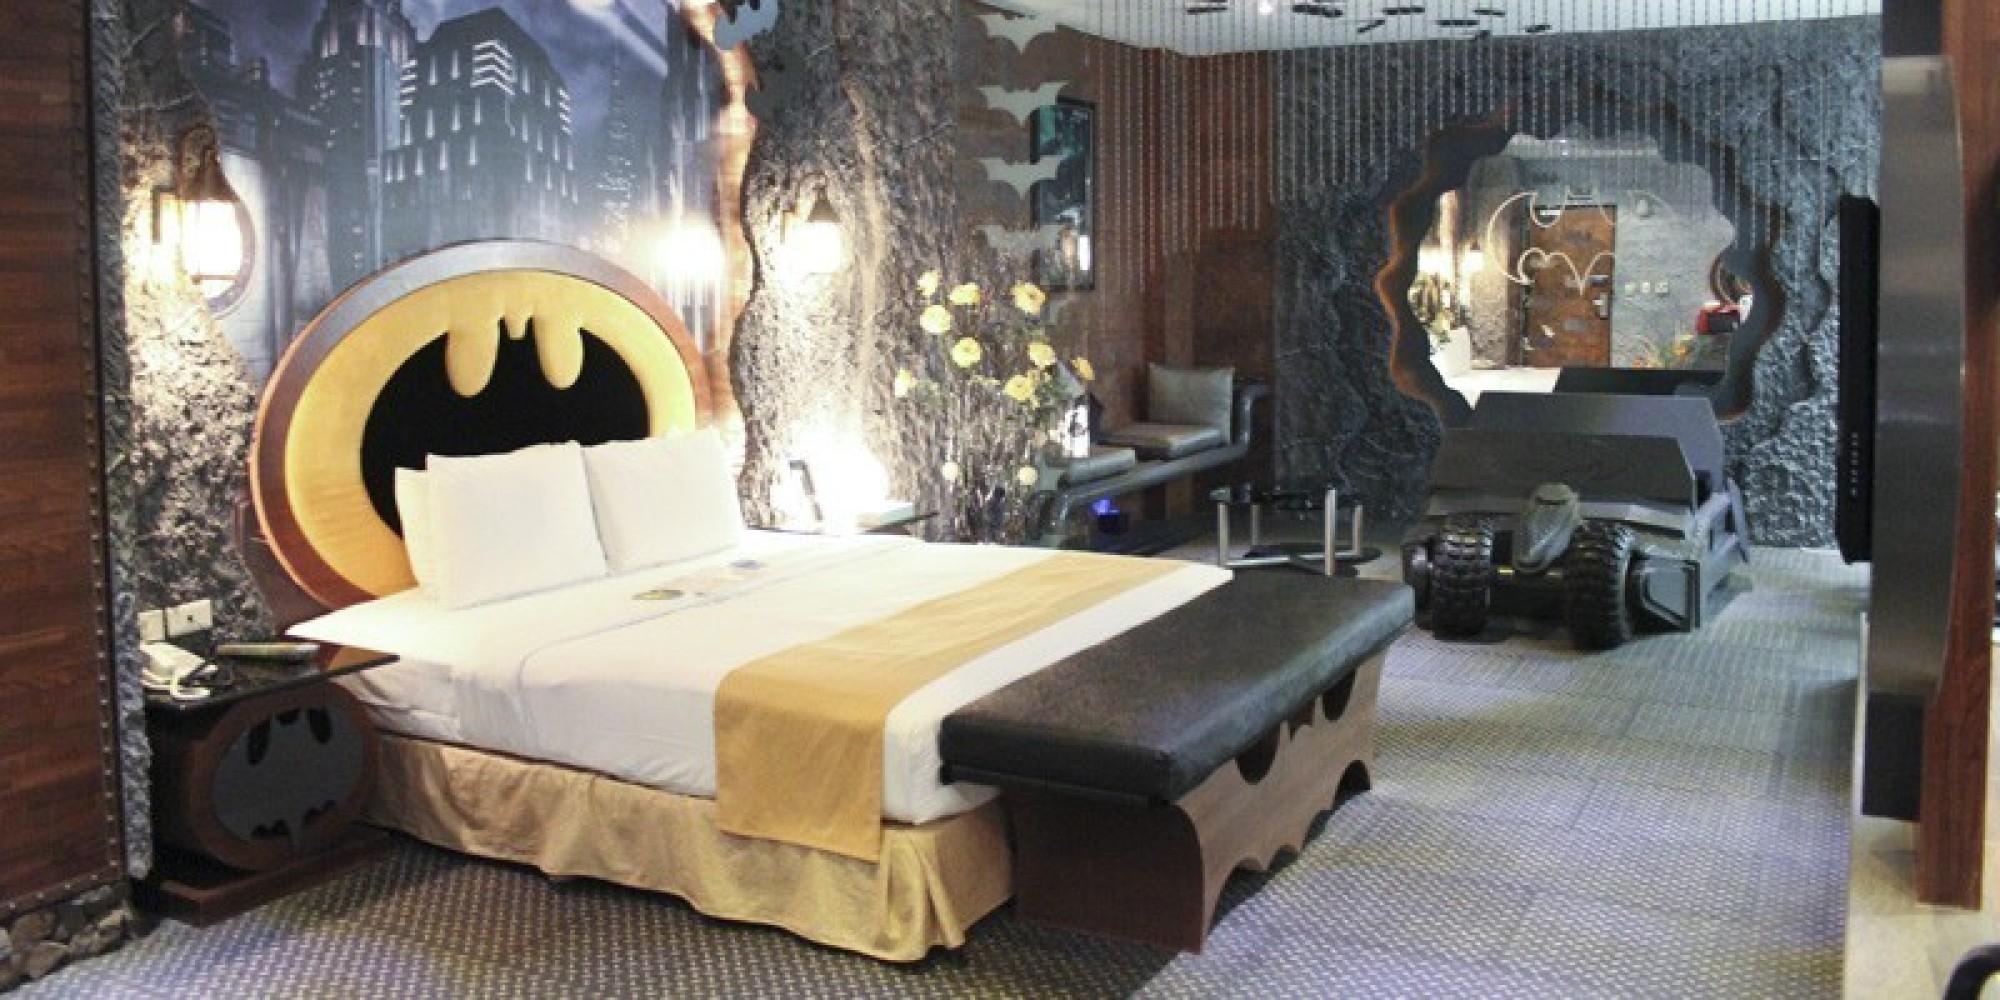 Eden Motel S Batcave Suite Is The Batman Themed Hotel Room